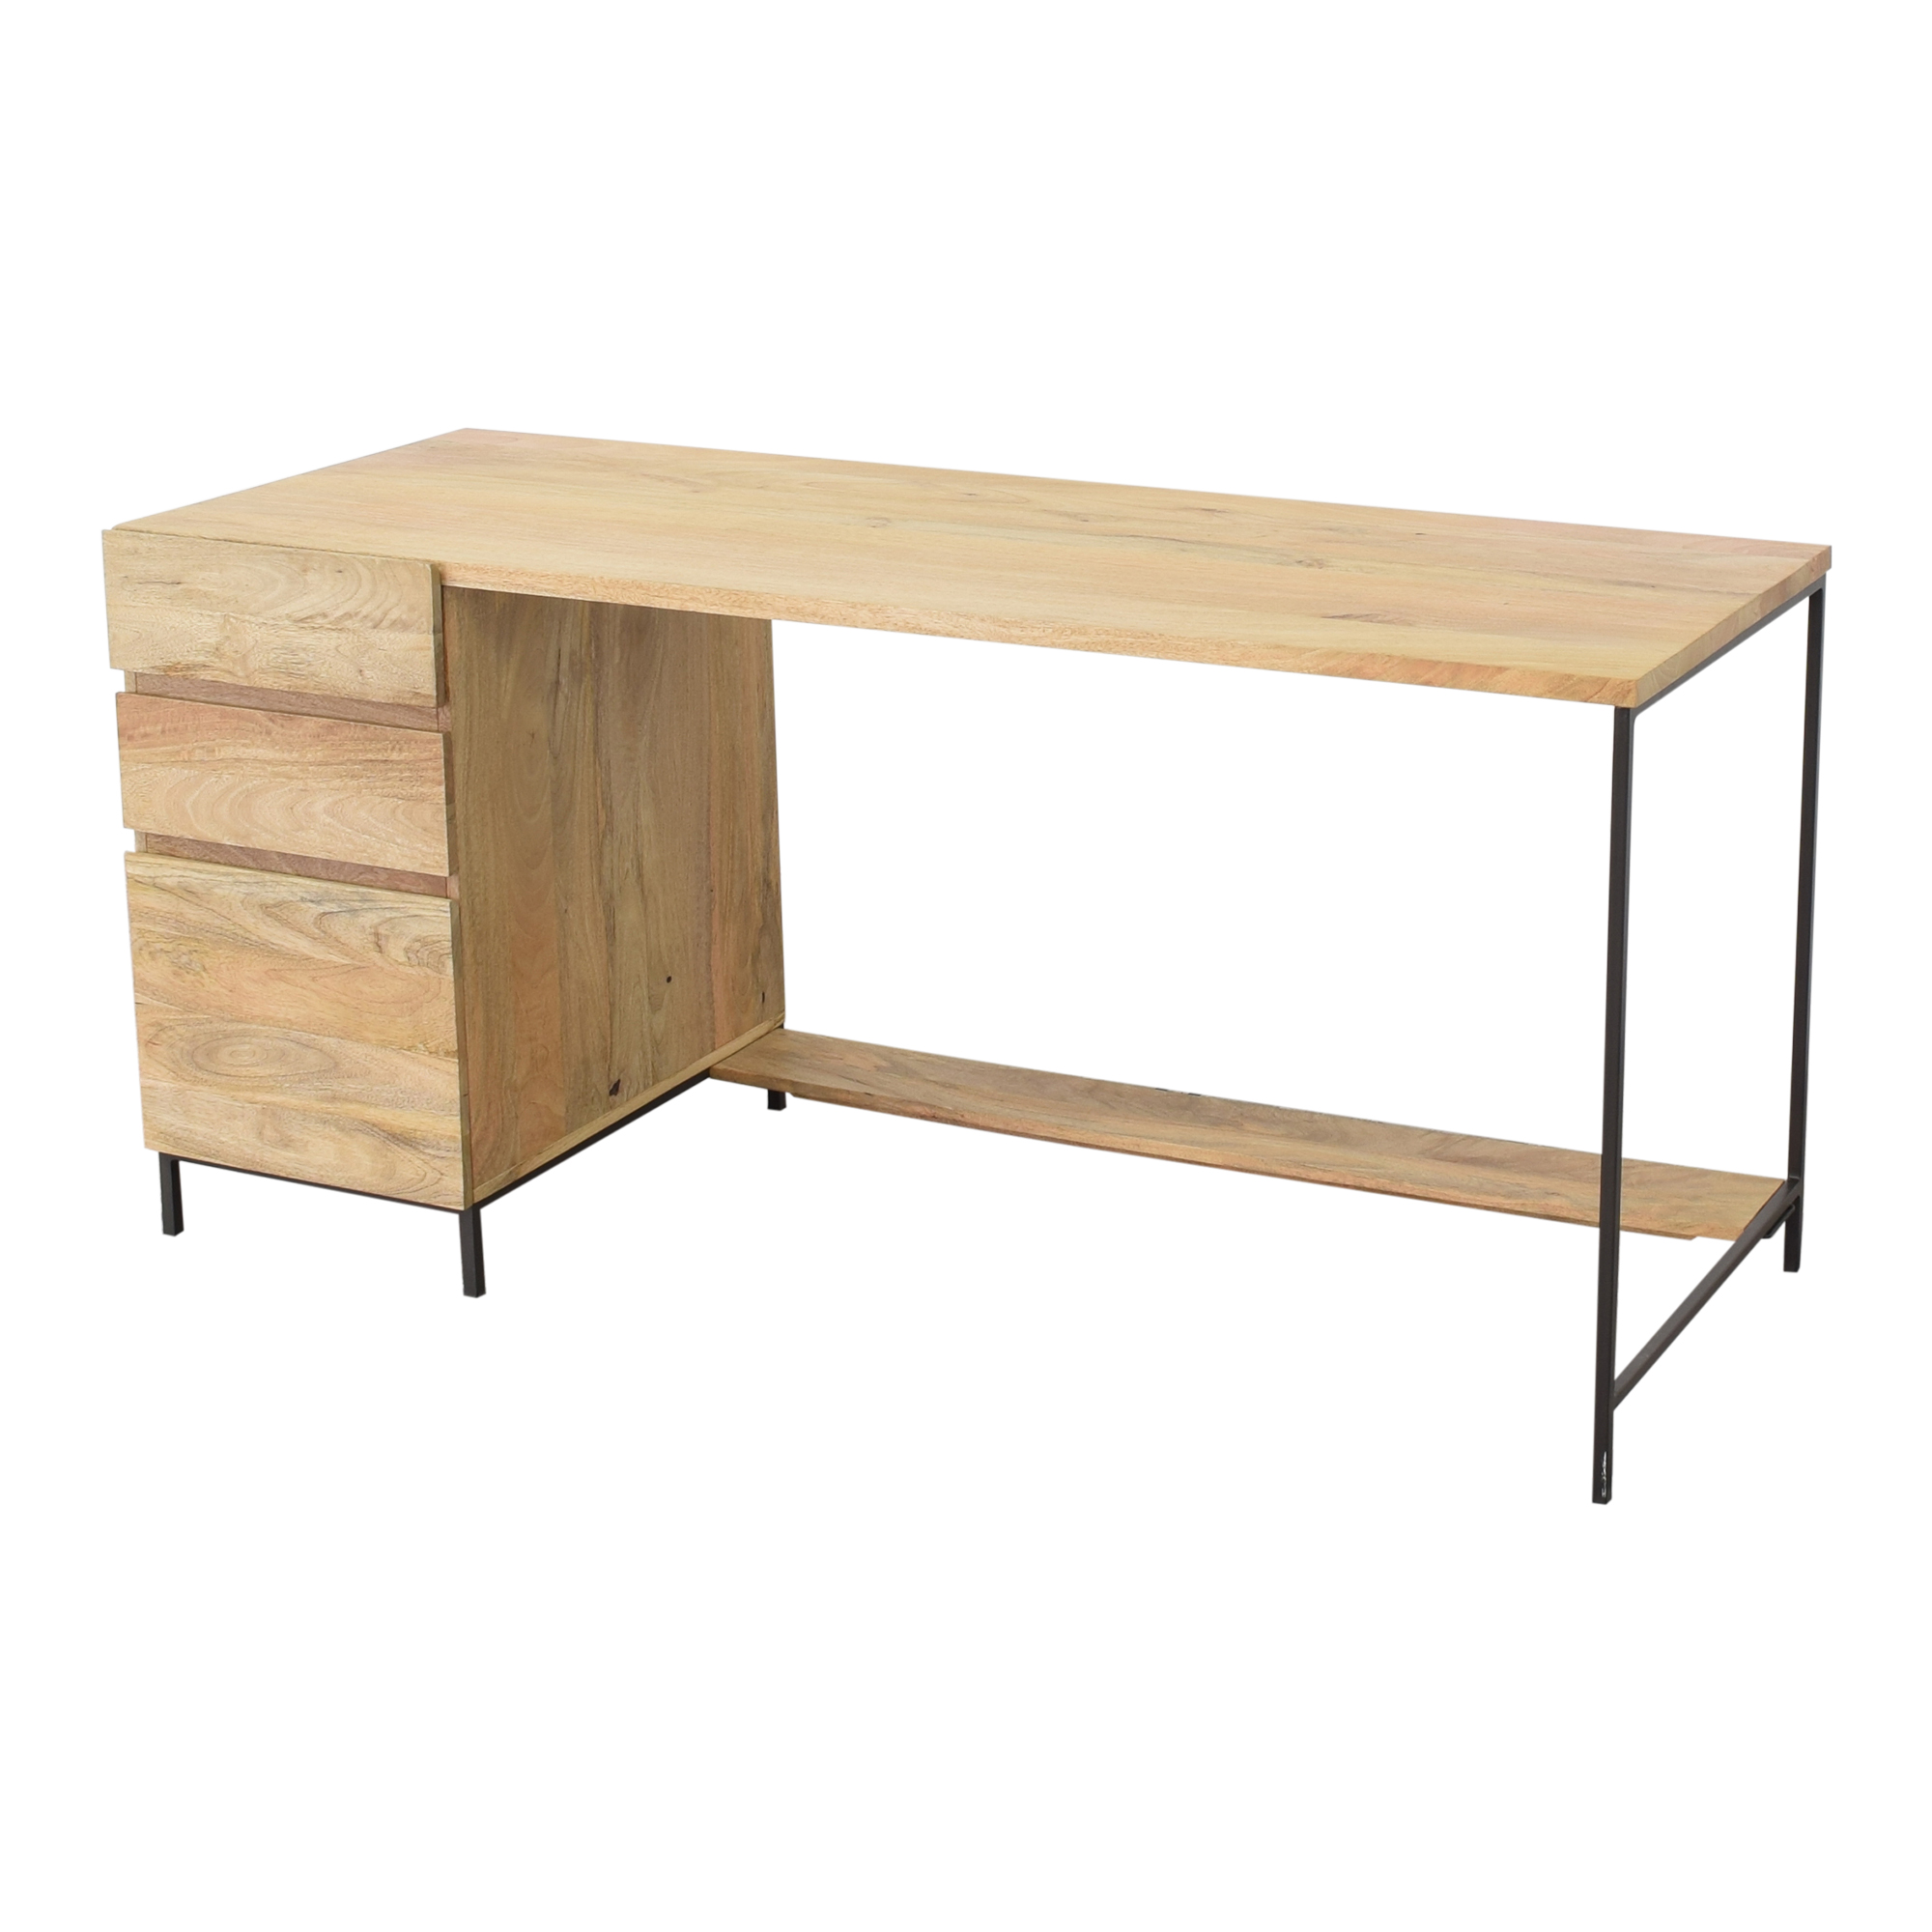 West Elm West Elm Industrial Modular Desk discount